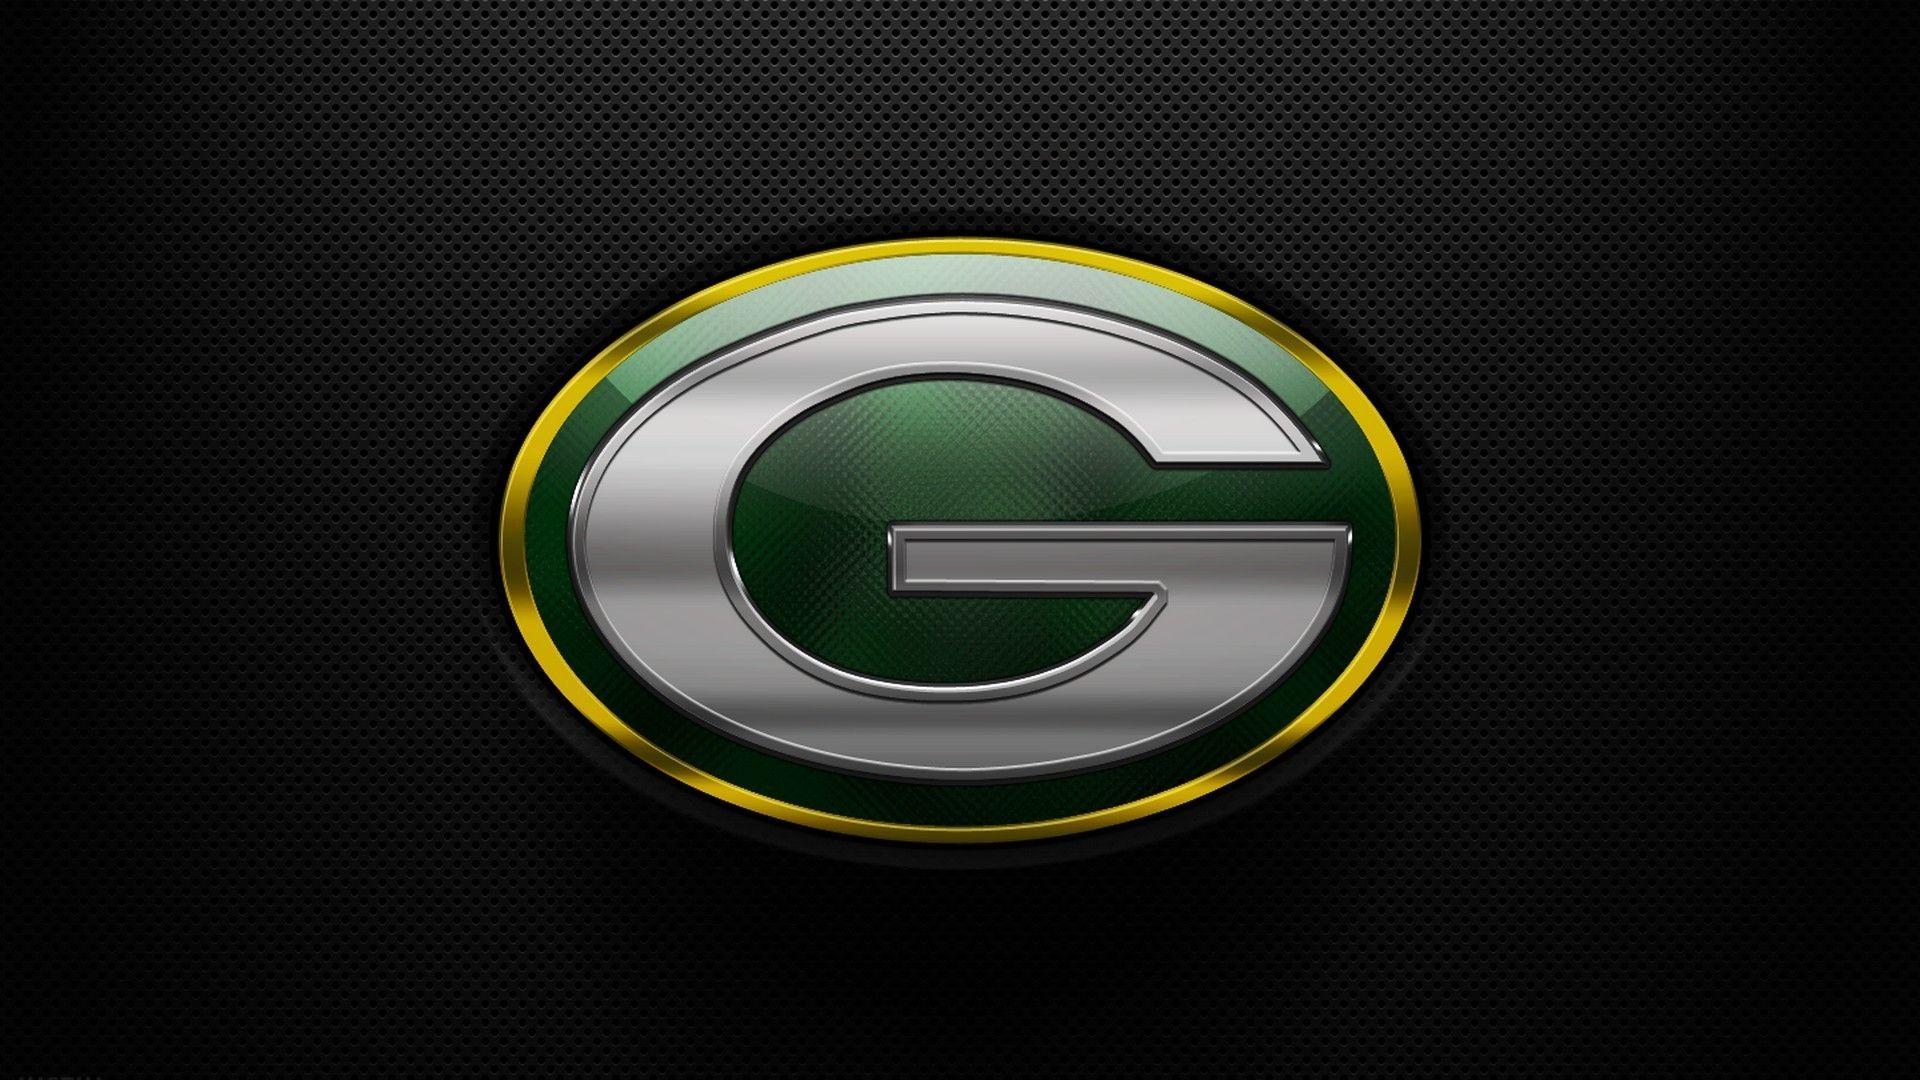 Fresh Packers Wallpaper Green Bay Packers Wallpaper Green Bay Packers Logo Green Bay Packers